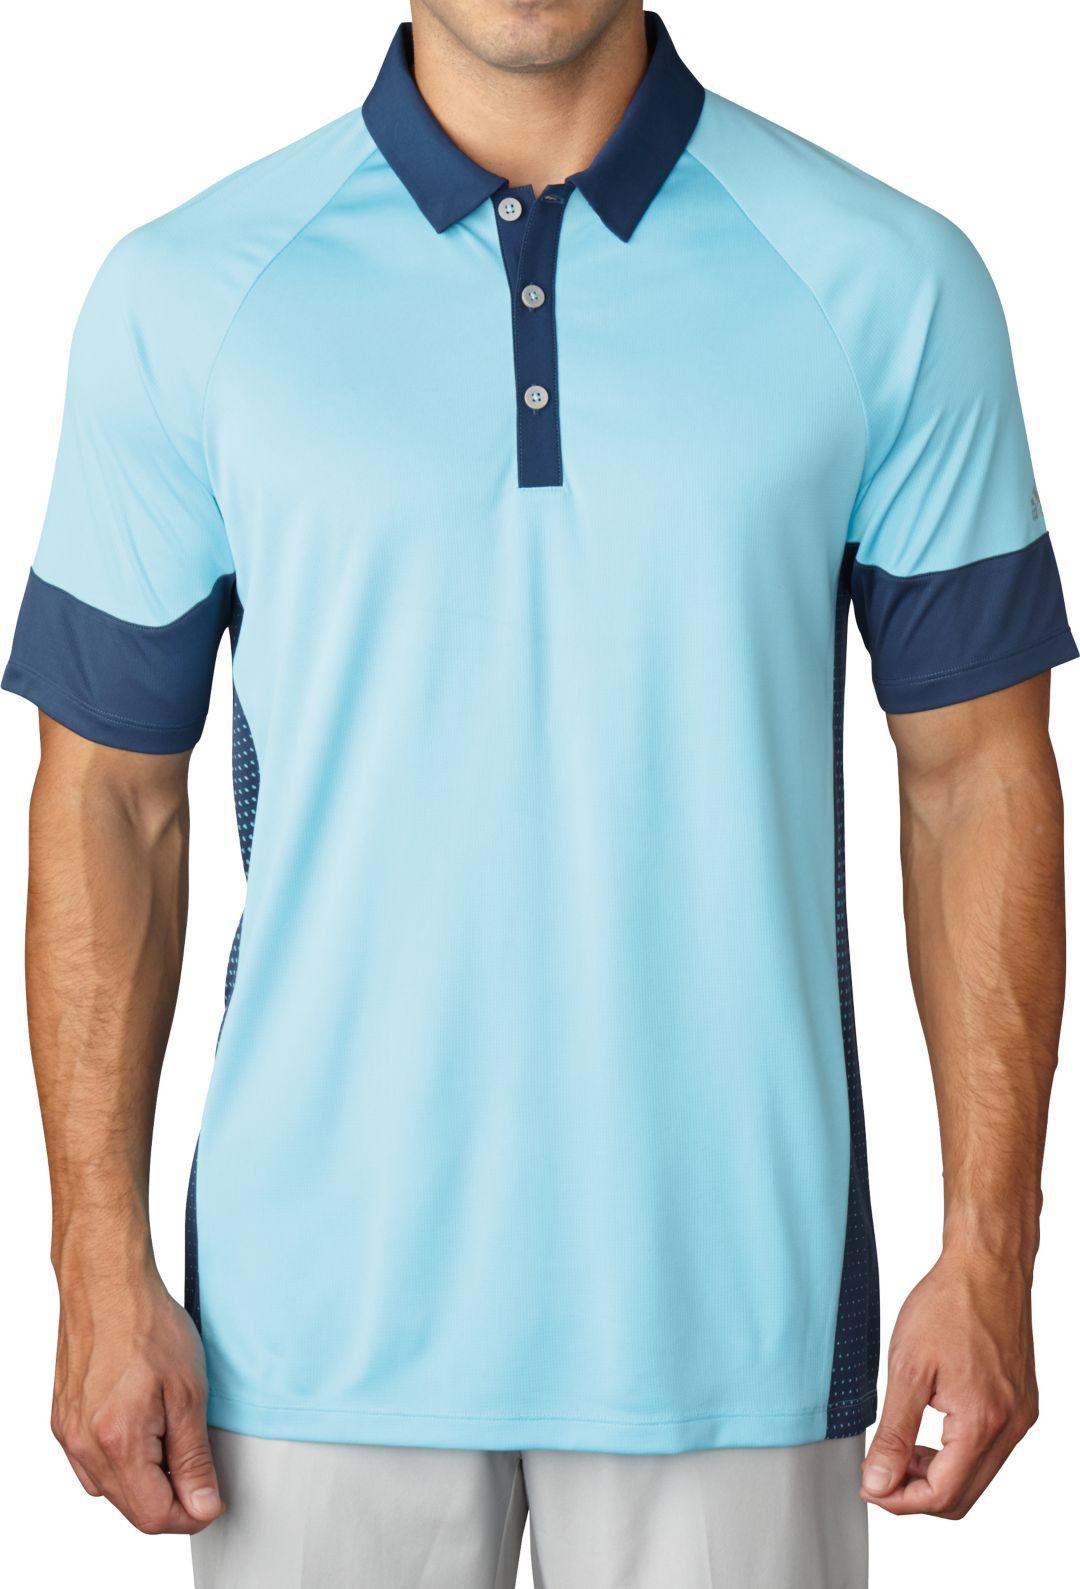 000a98ab9766 adidas Men's climachill® Print Block Golf Polo